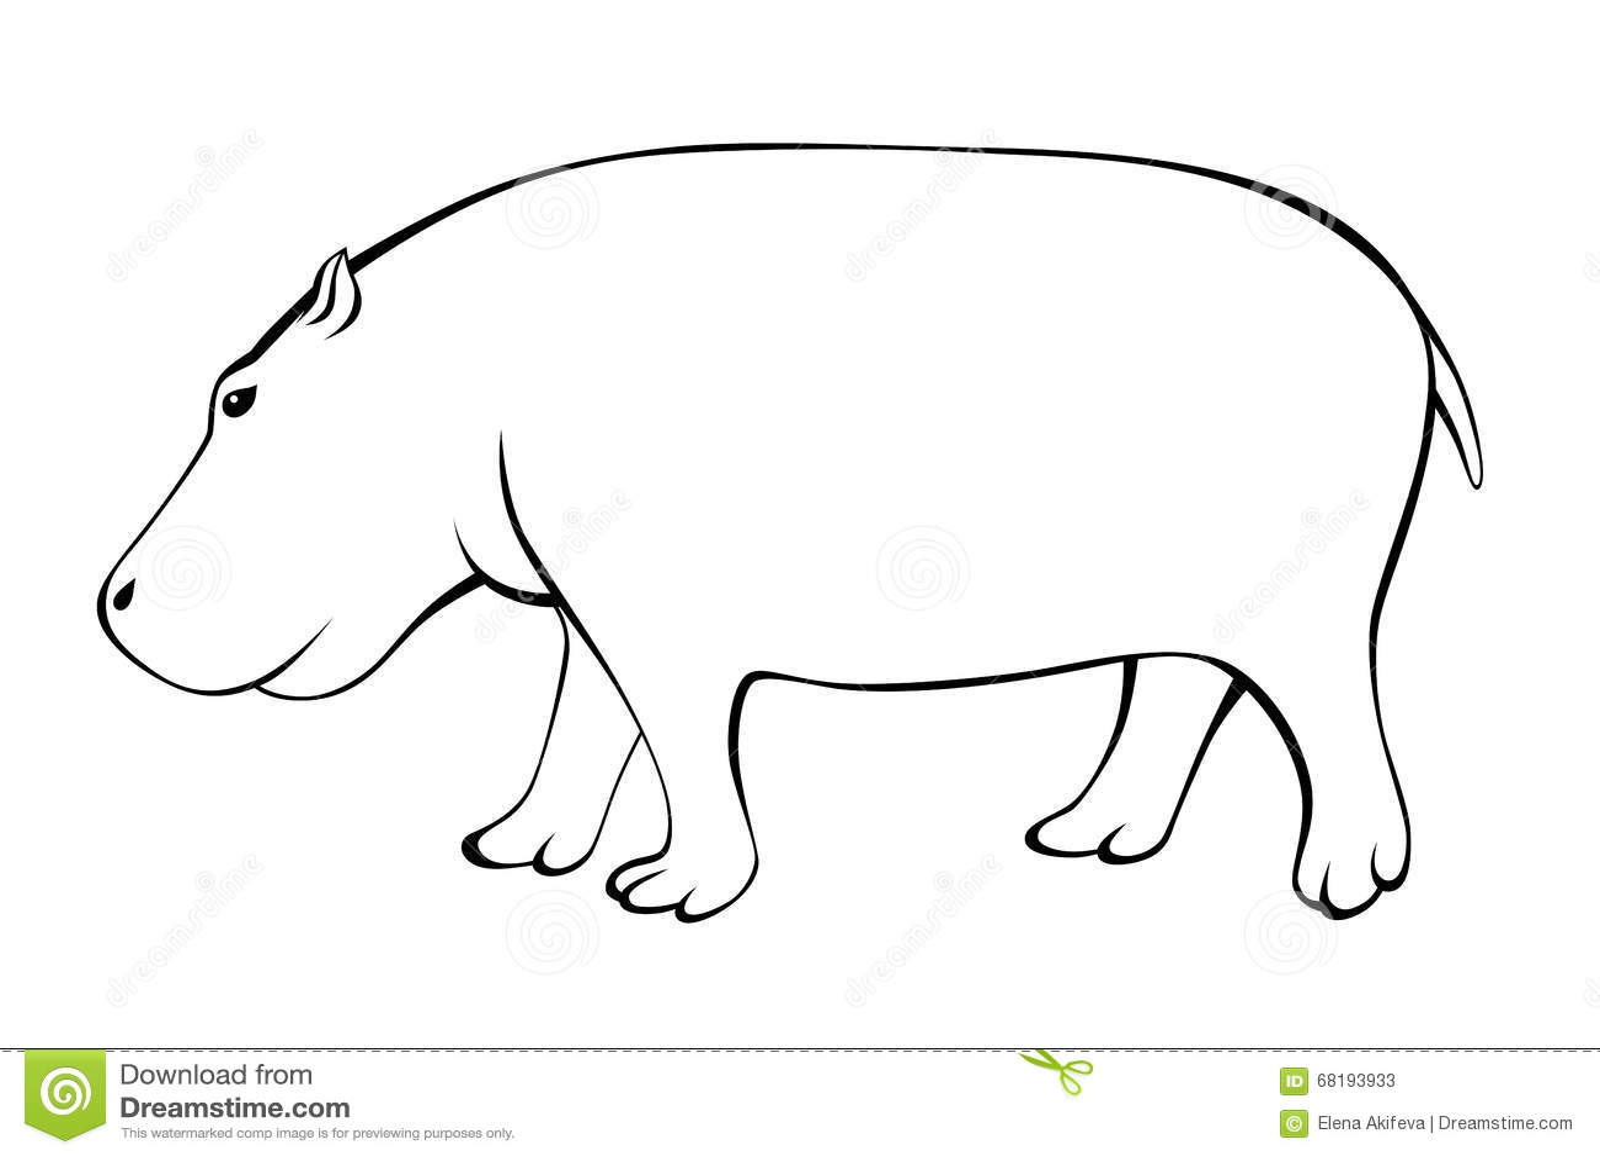 hippo black white isolated illustration stock vector